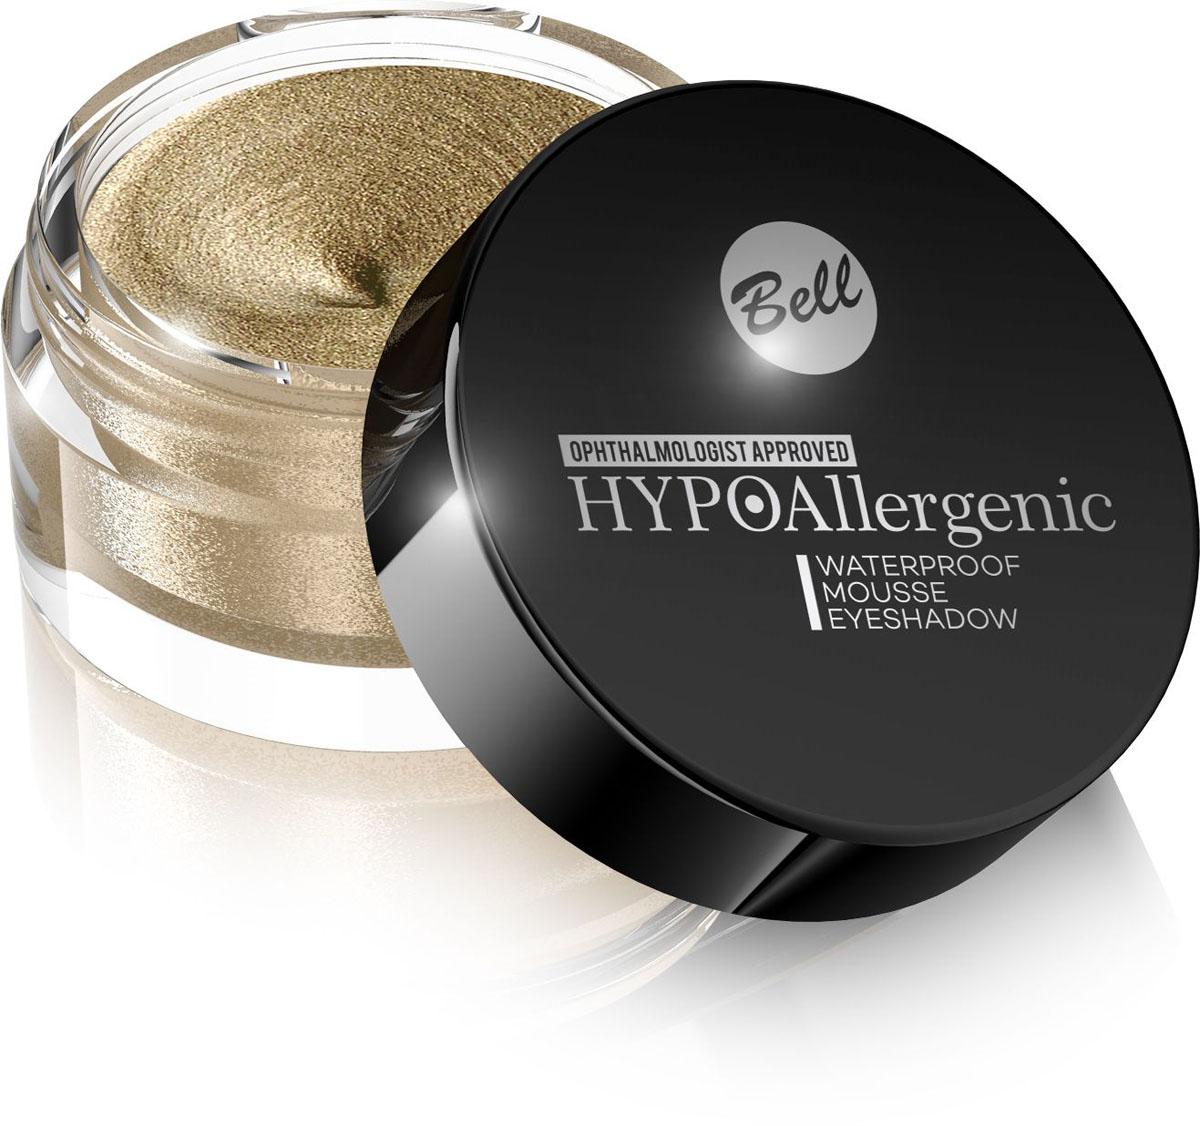 Bell Hypoallergenic Кремовые тени для век Waterproof Mousse Eyeshadow, Тон №02, 23 мл